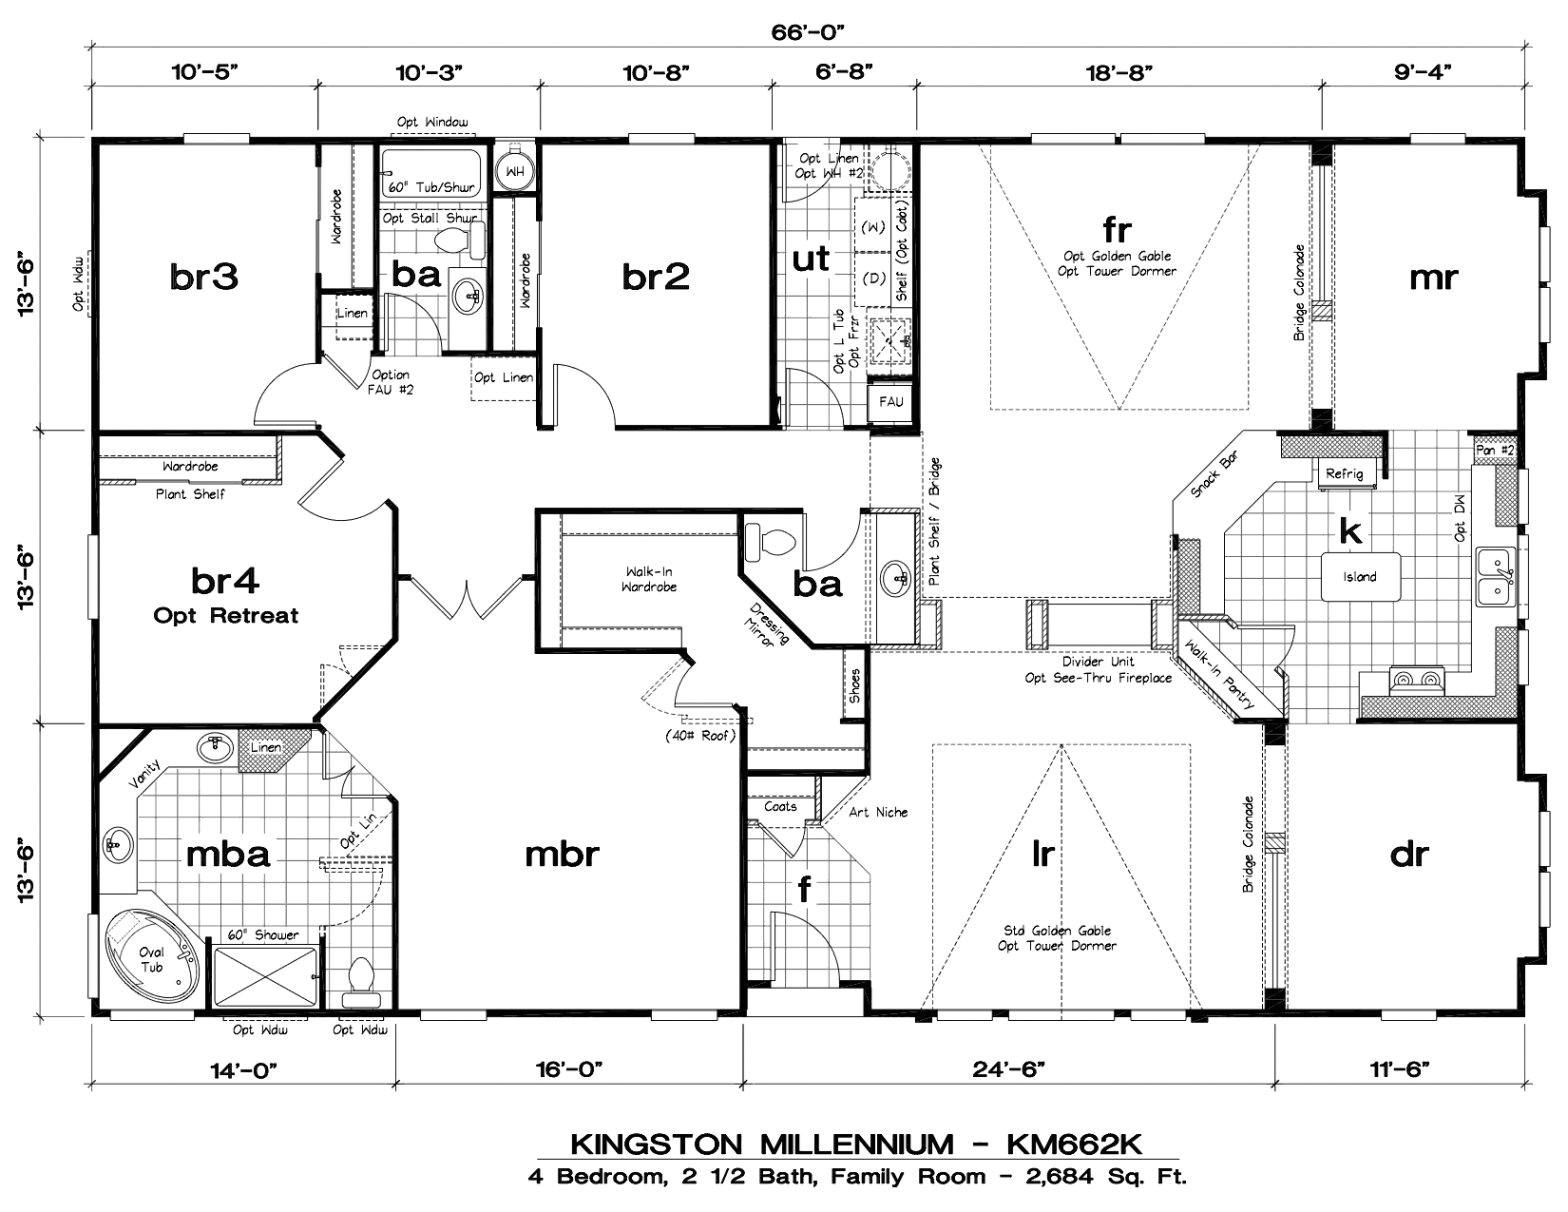 live oak manufactured homes floor plans luxury triple wide mobile home floor plans mobile home floor plans in